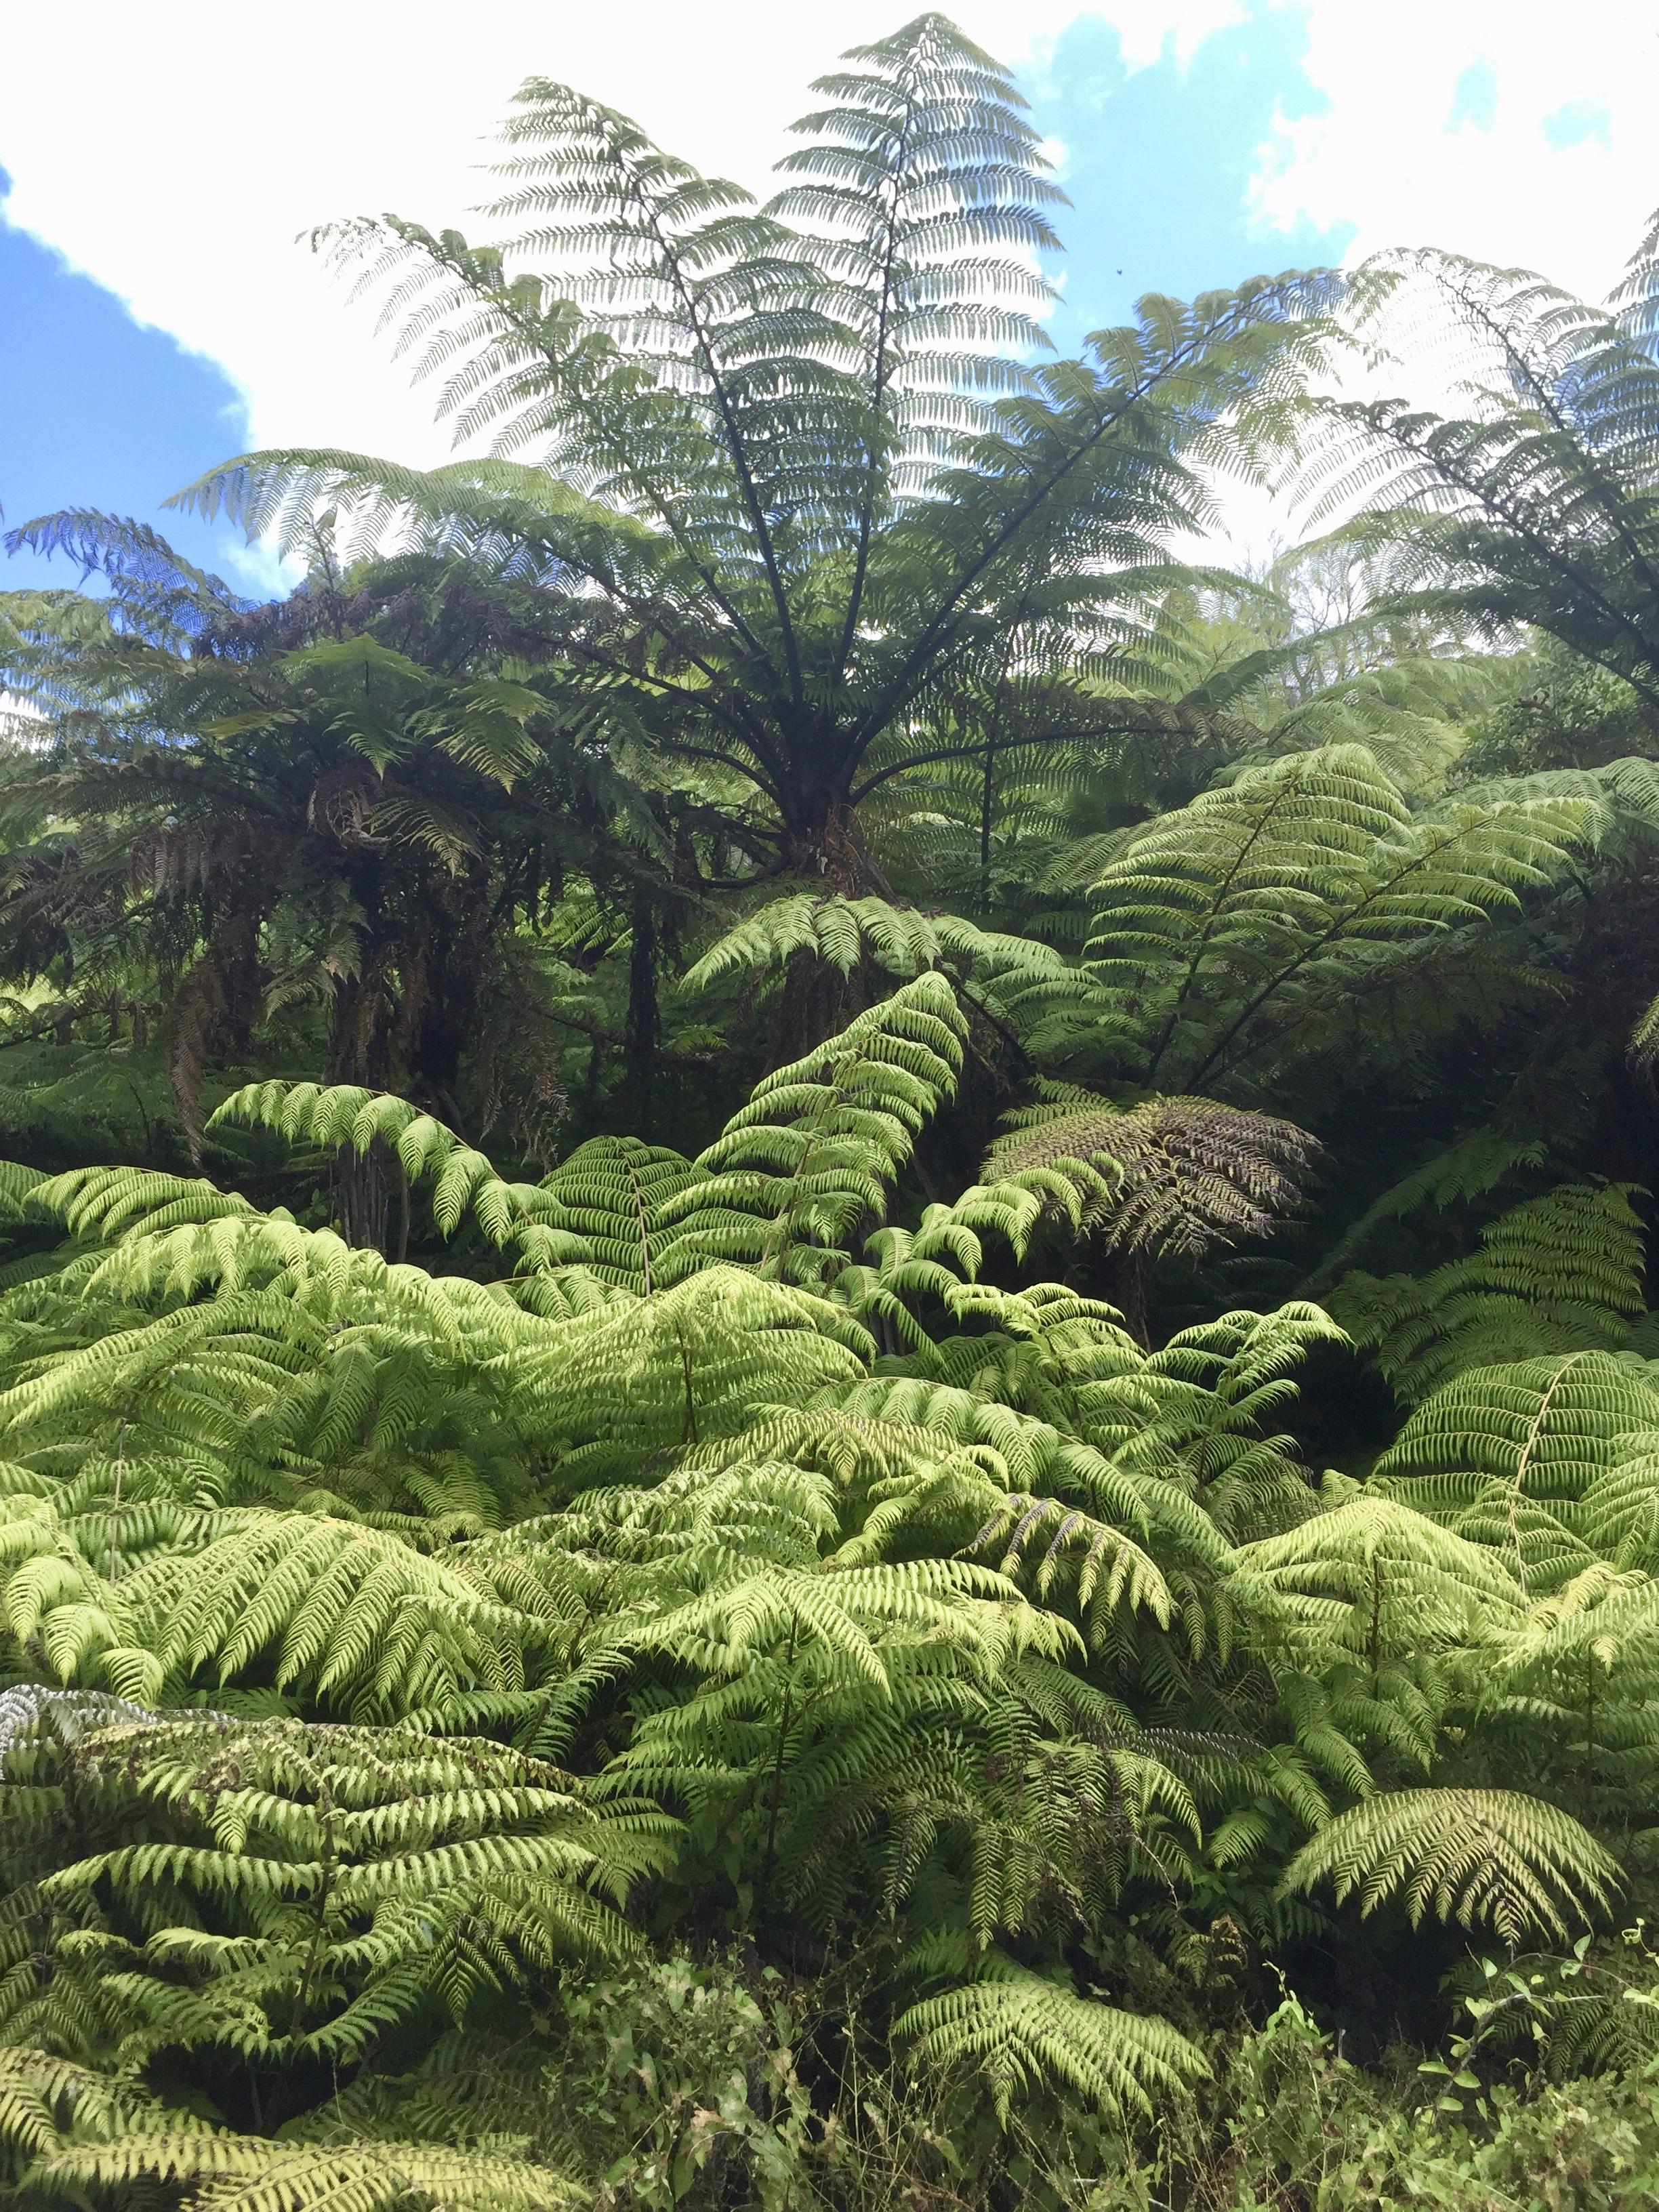 Tree ferns